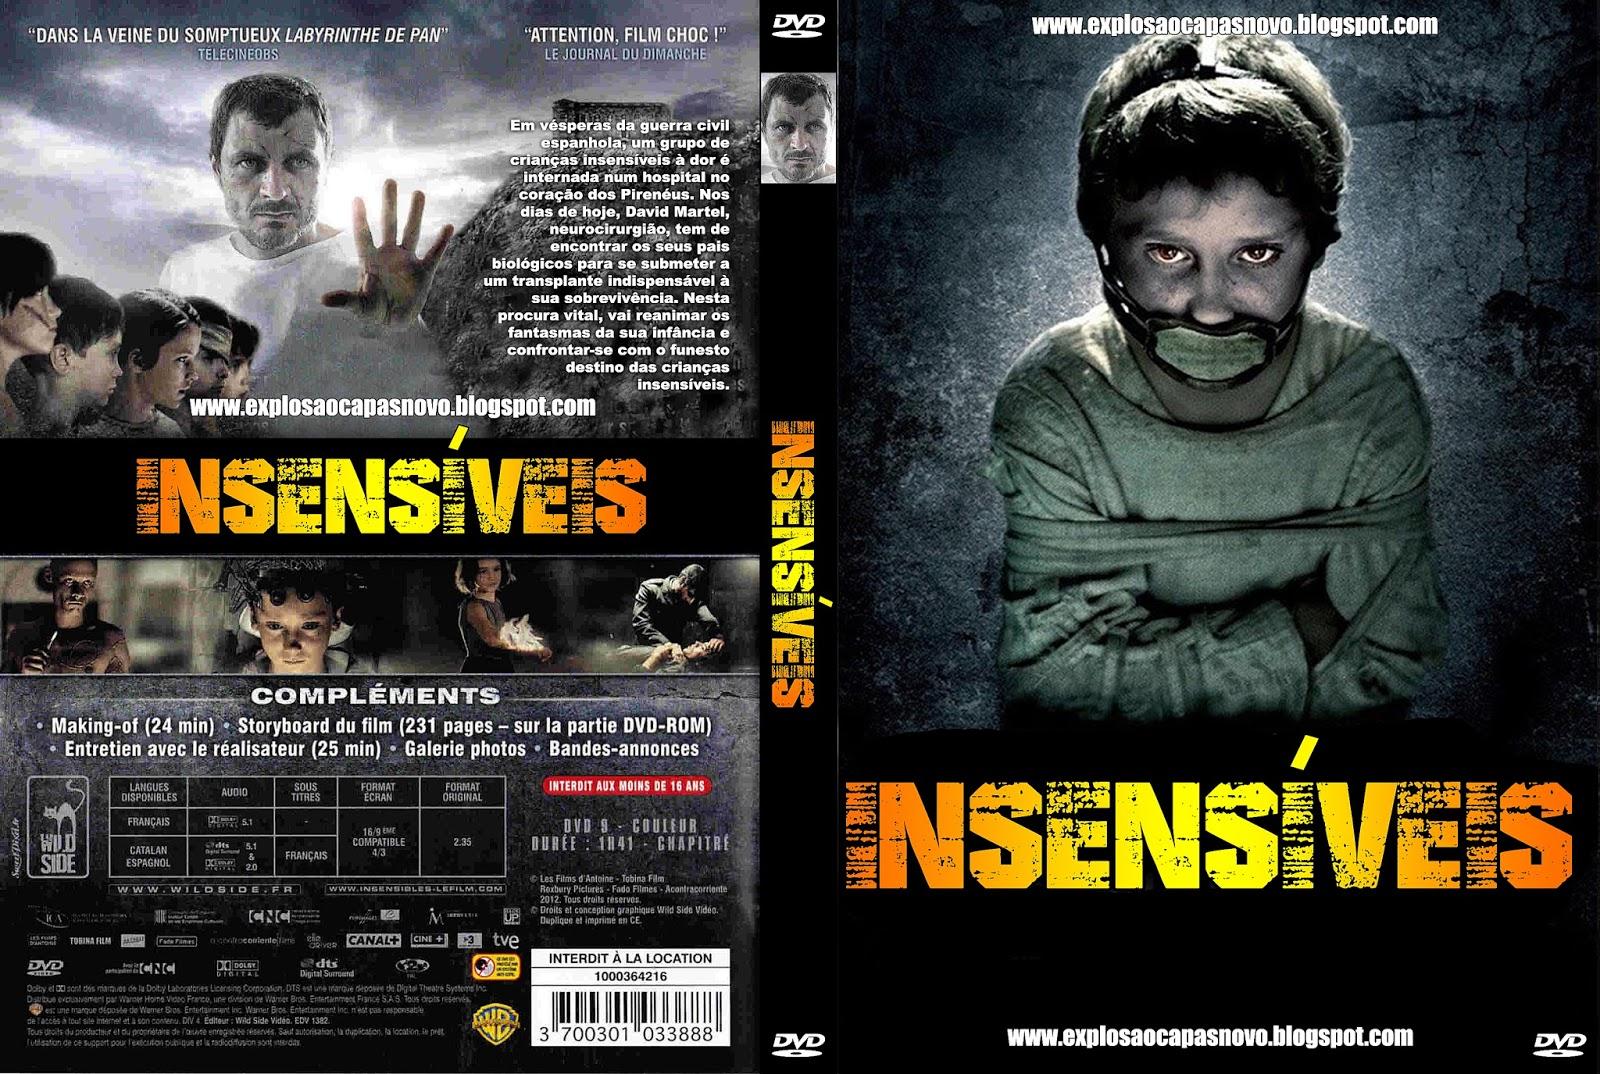 Download Insensíveis DVD-R Autorado Insensiveis